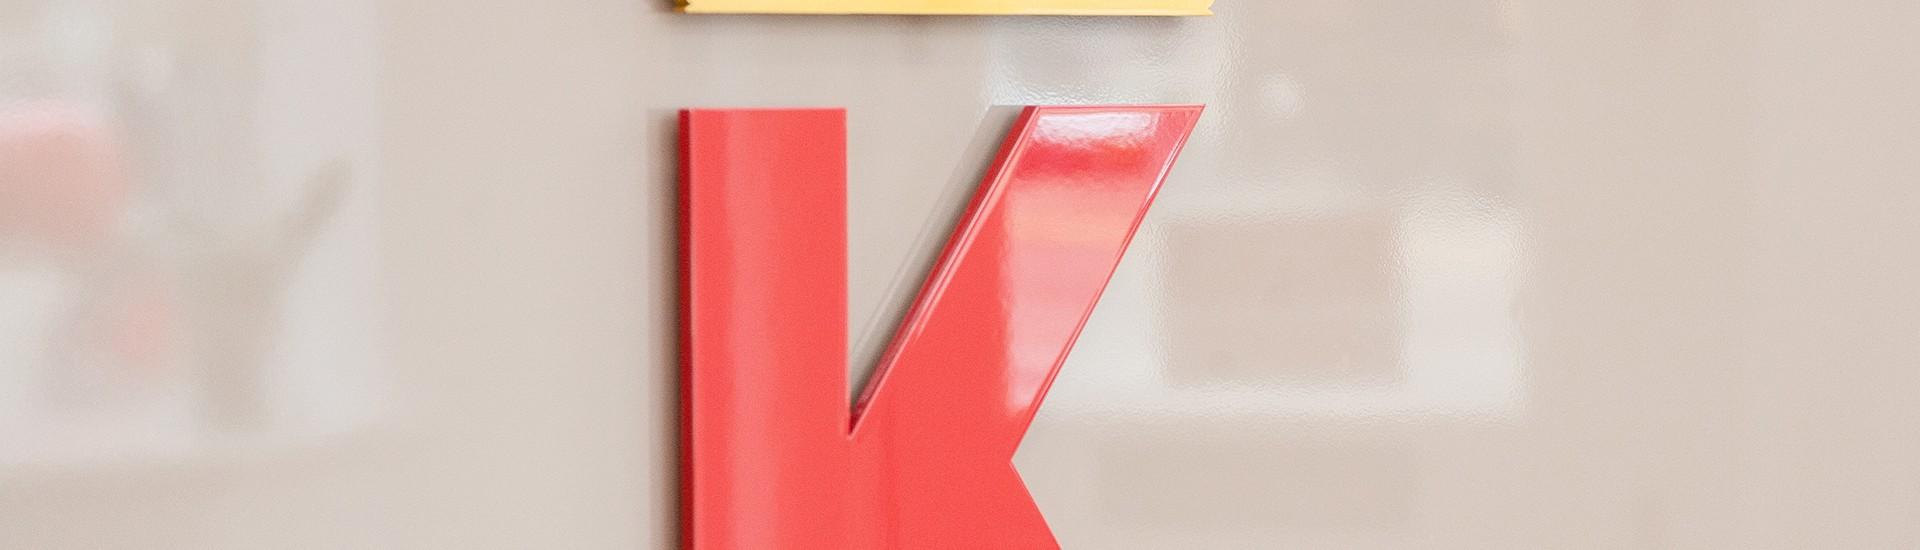 Kbal-hairstylist-Kapsalon-Amsterdam-K-logo